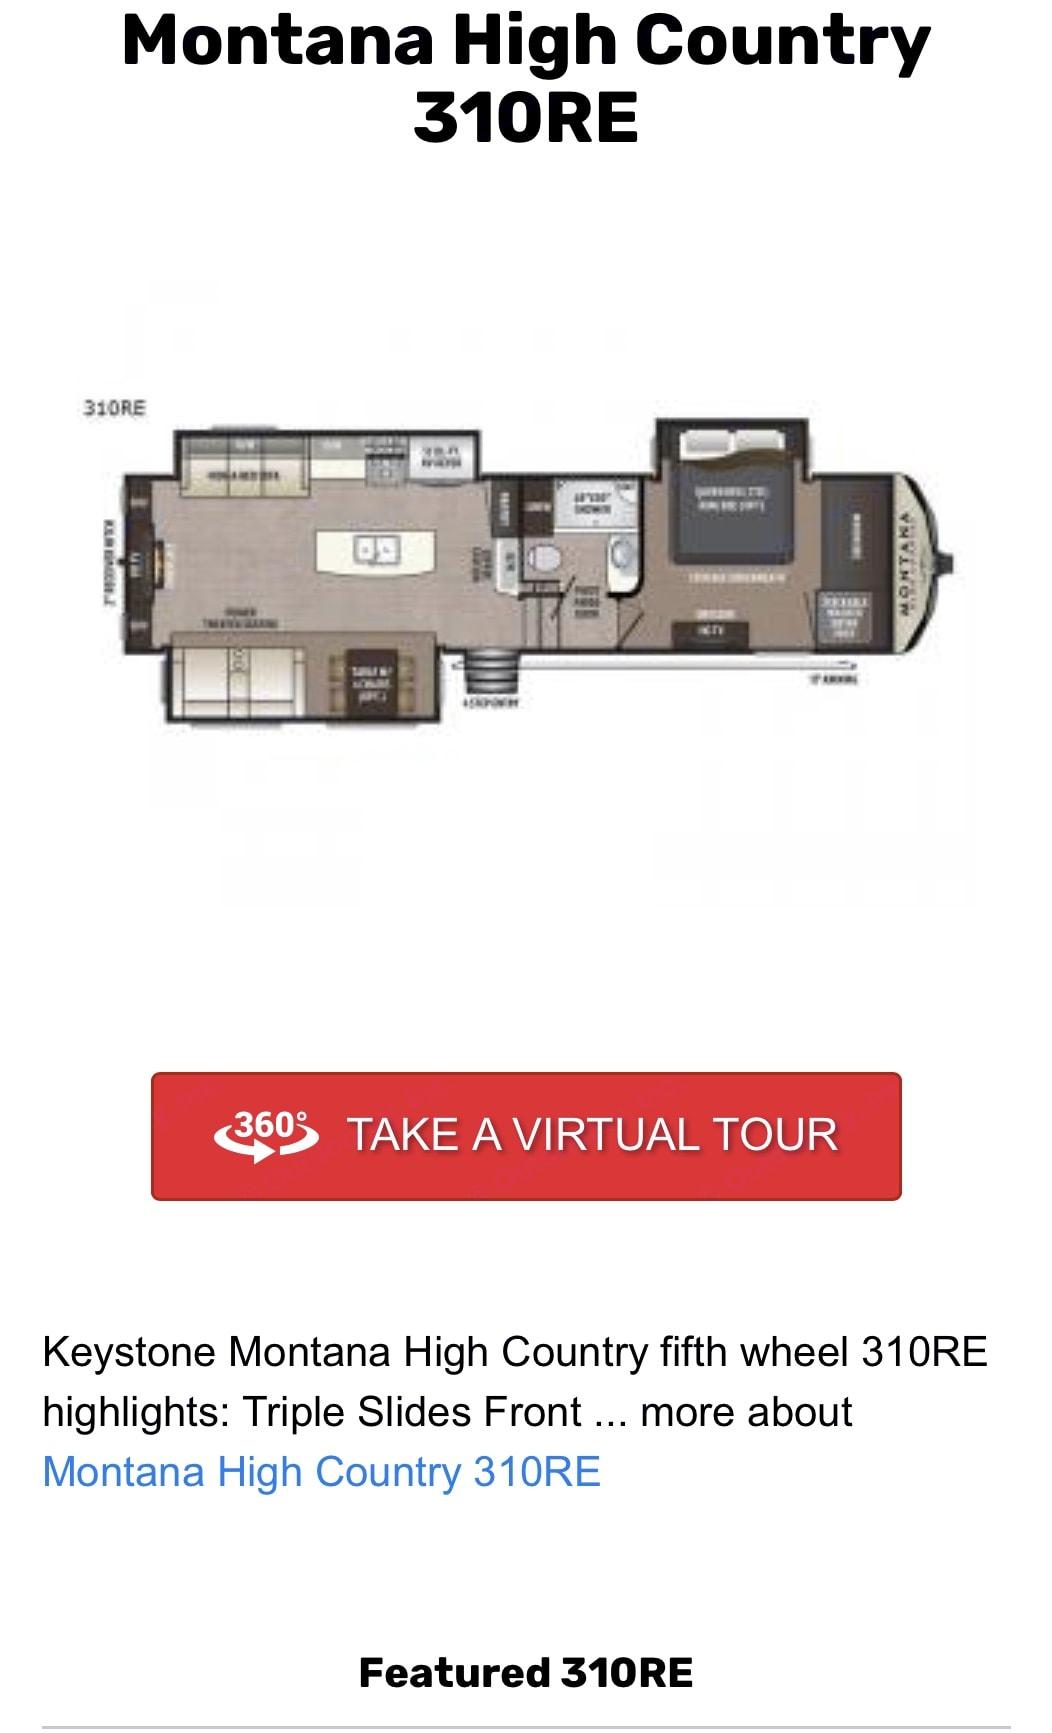 Keystone Montana High Country 2016